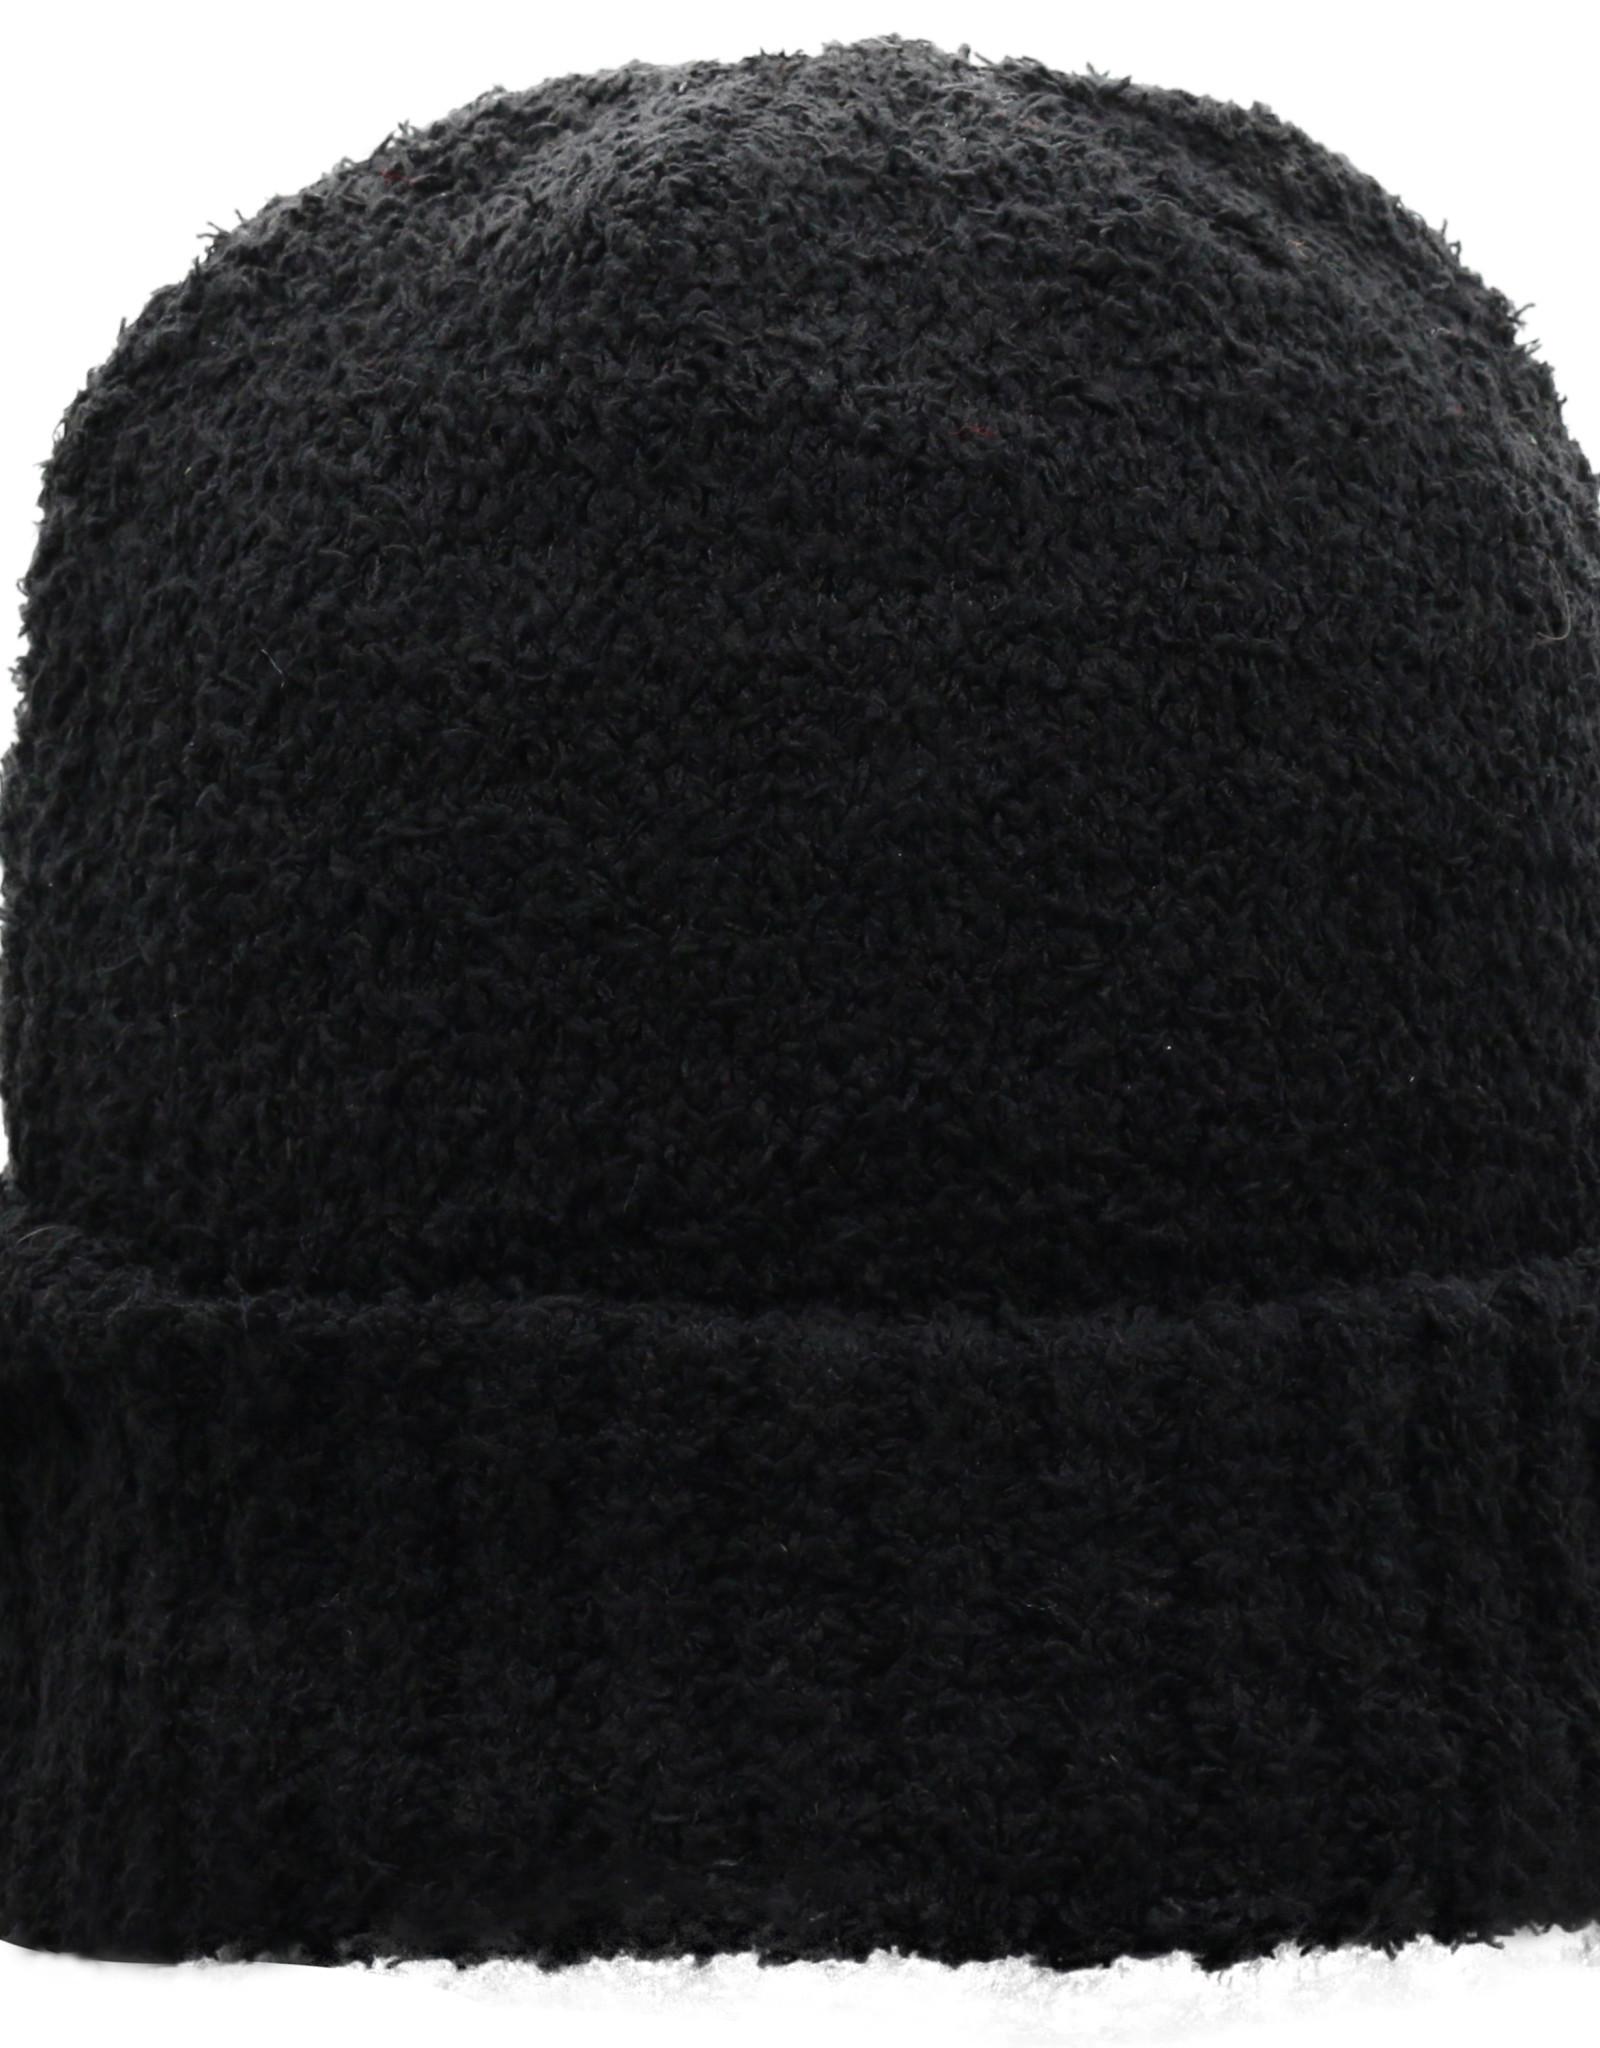 TOW TOW Marsh Black Fuzzy Knit Cap